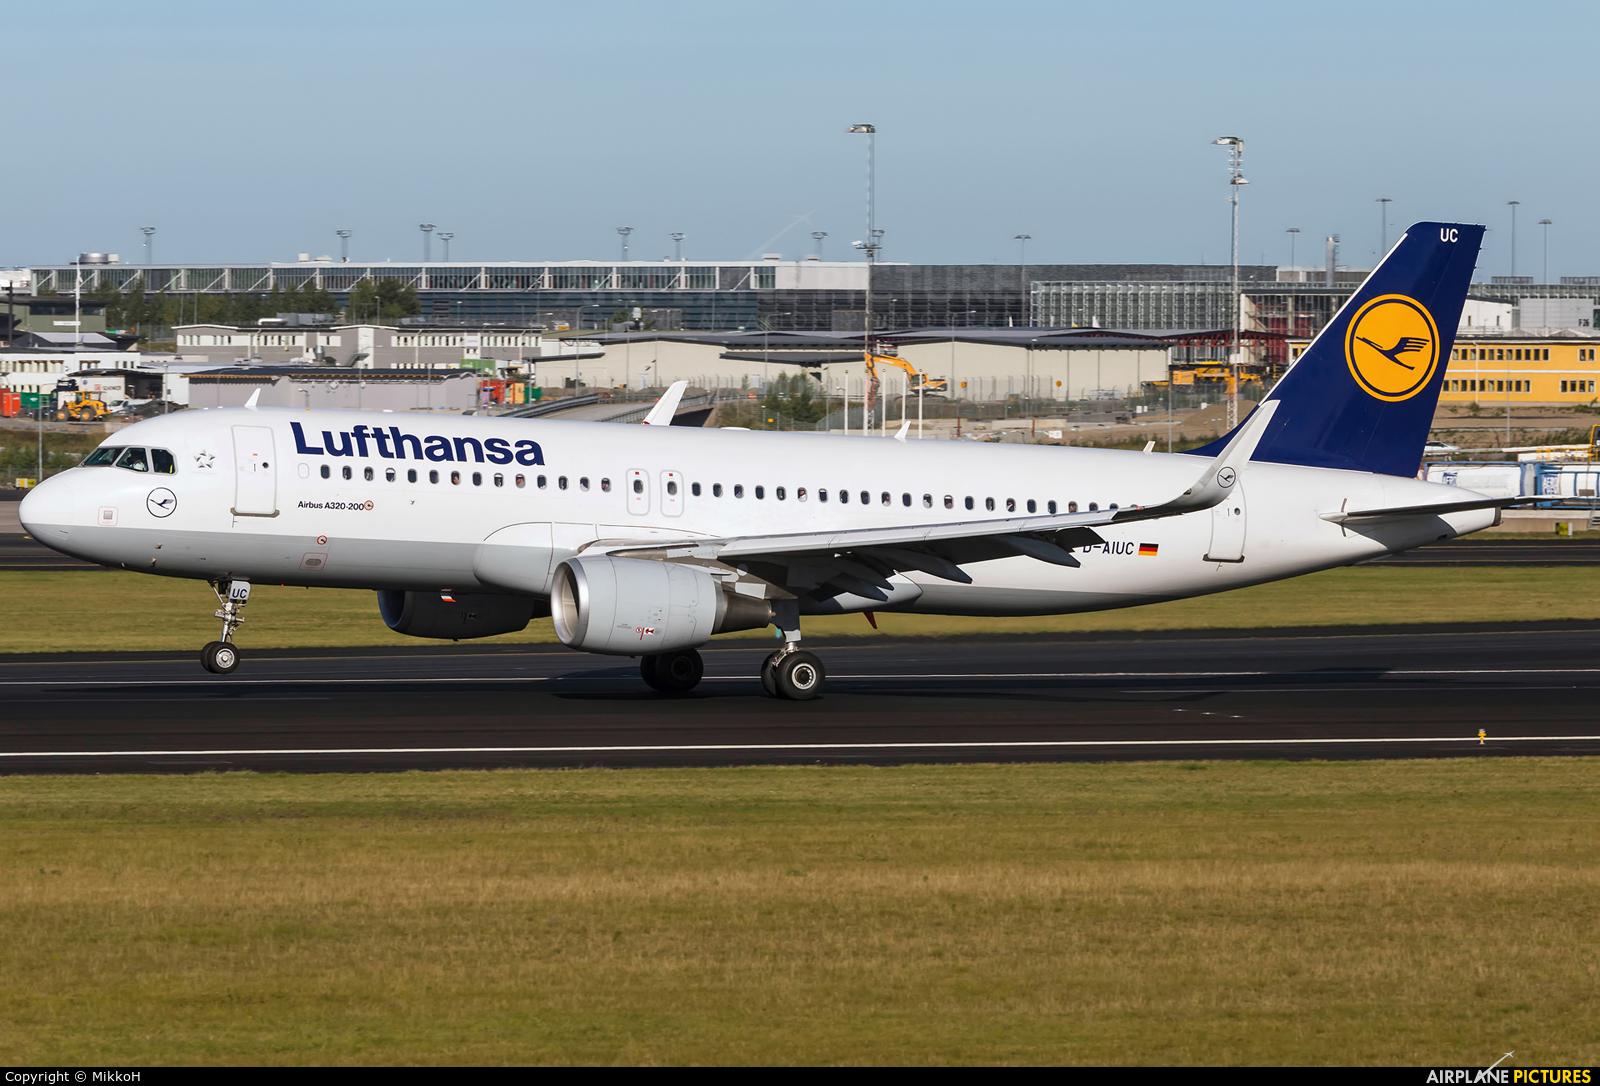 Lufthansa D-AIUC aircraft at Stockholm - Arlanda